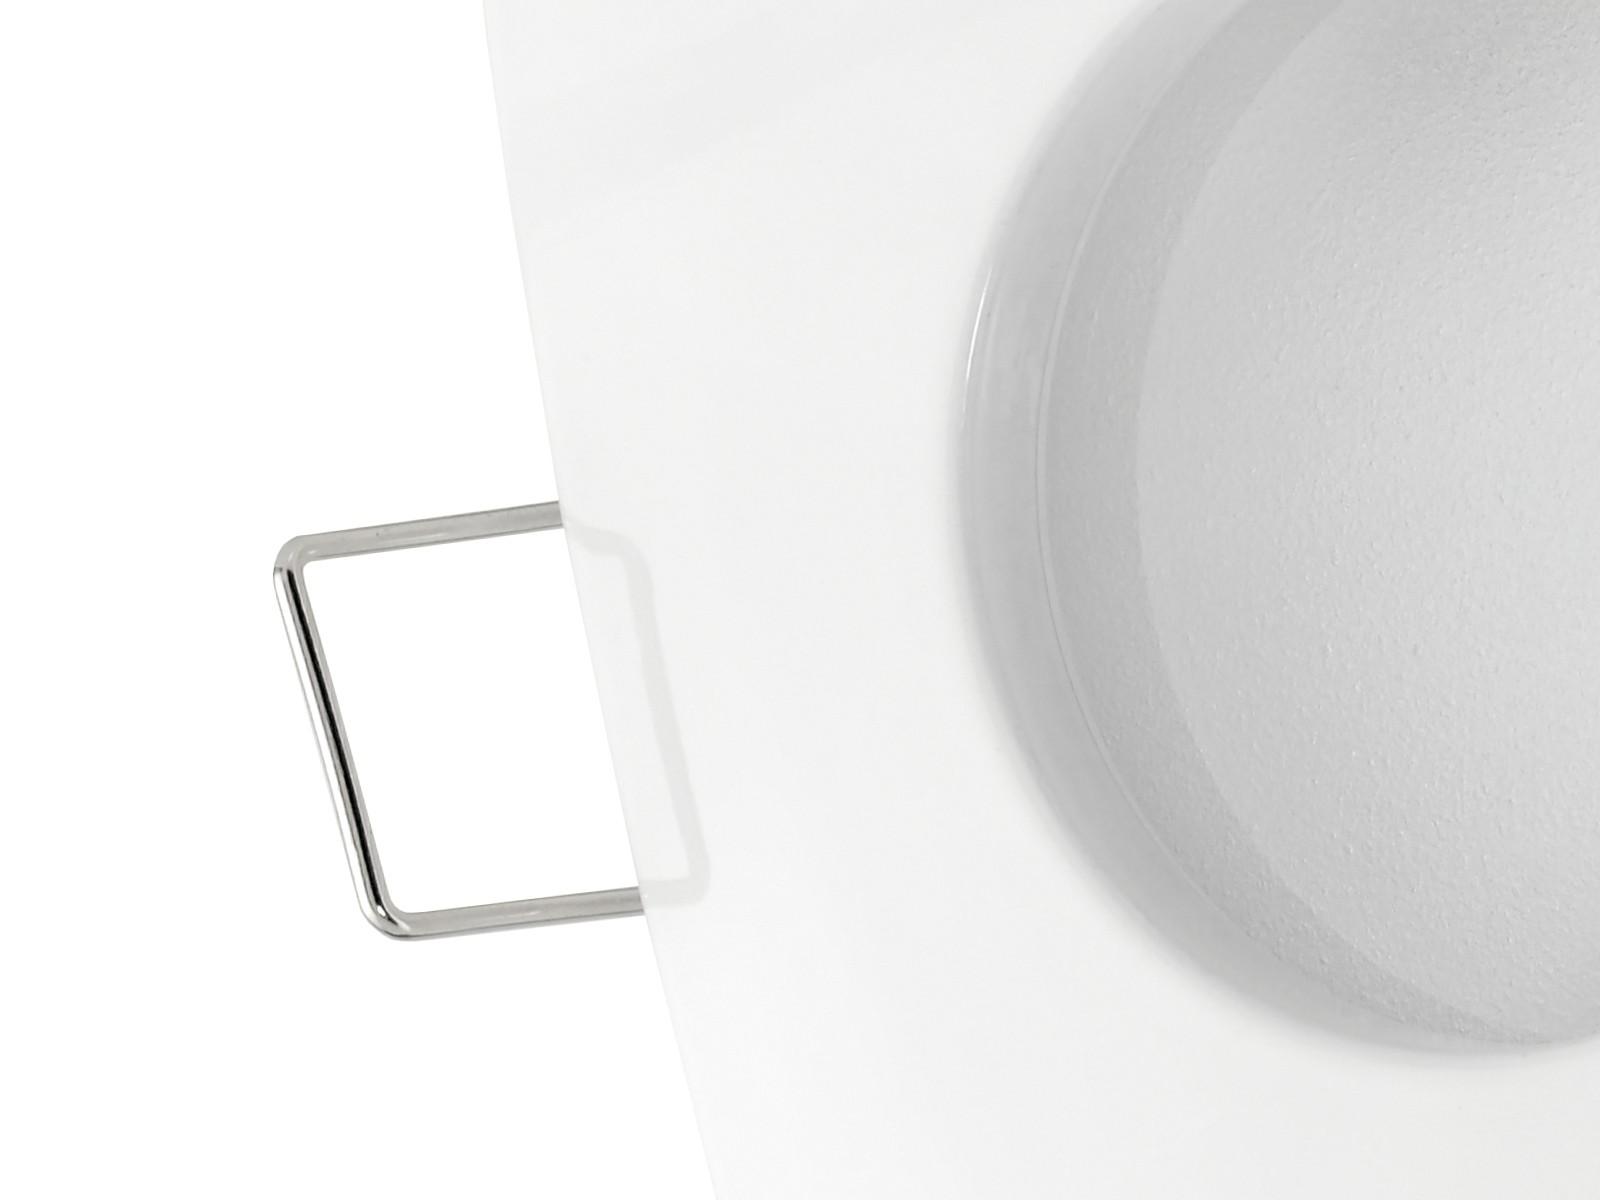 dusche led strahler raum und m beldesign inspiration. Black Bedroom Furniture Sets. Home Design Ideas